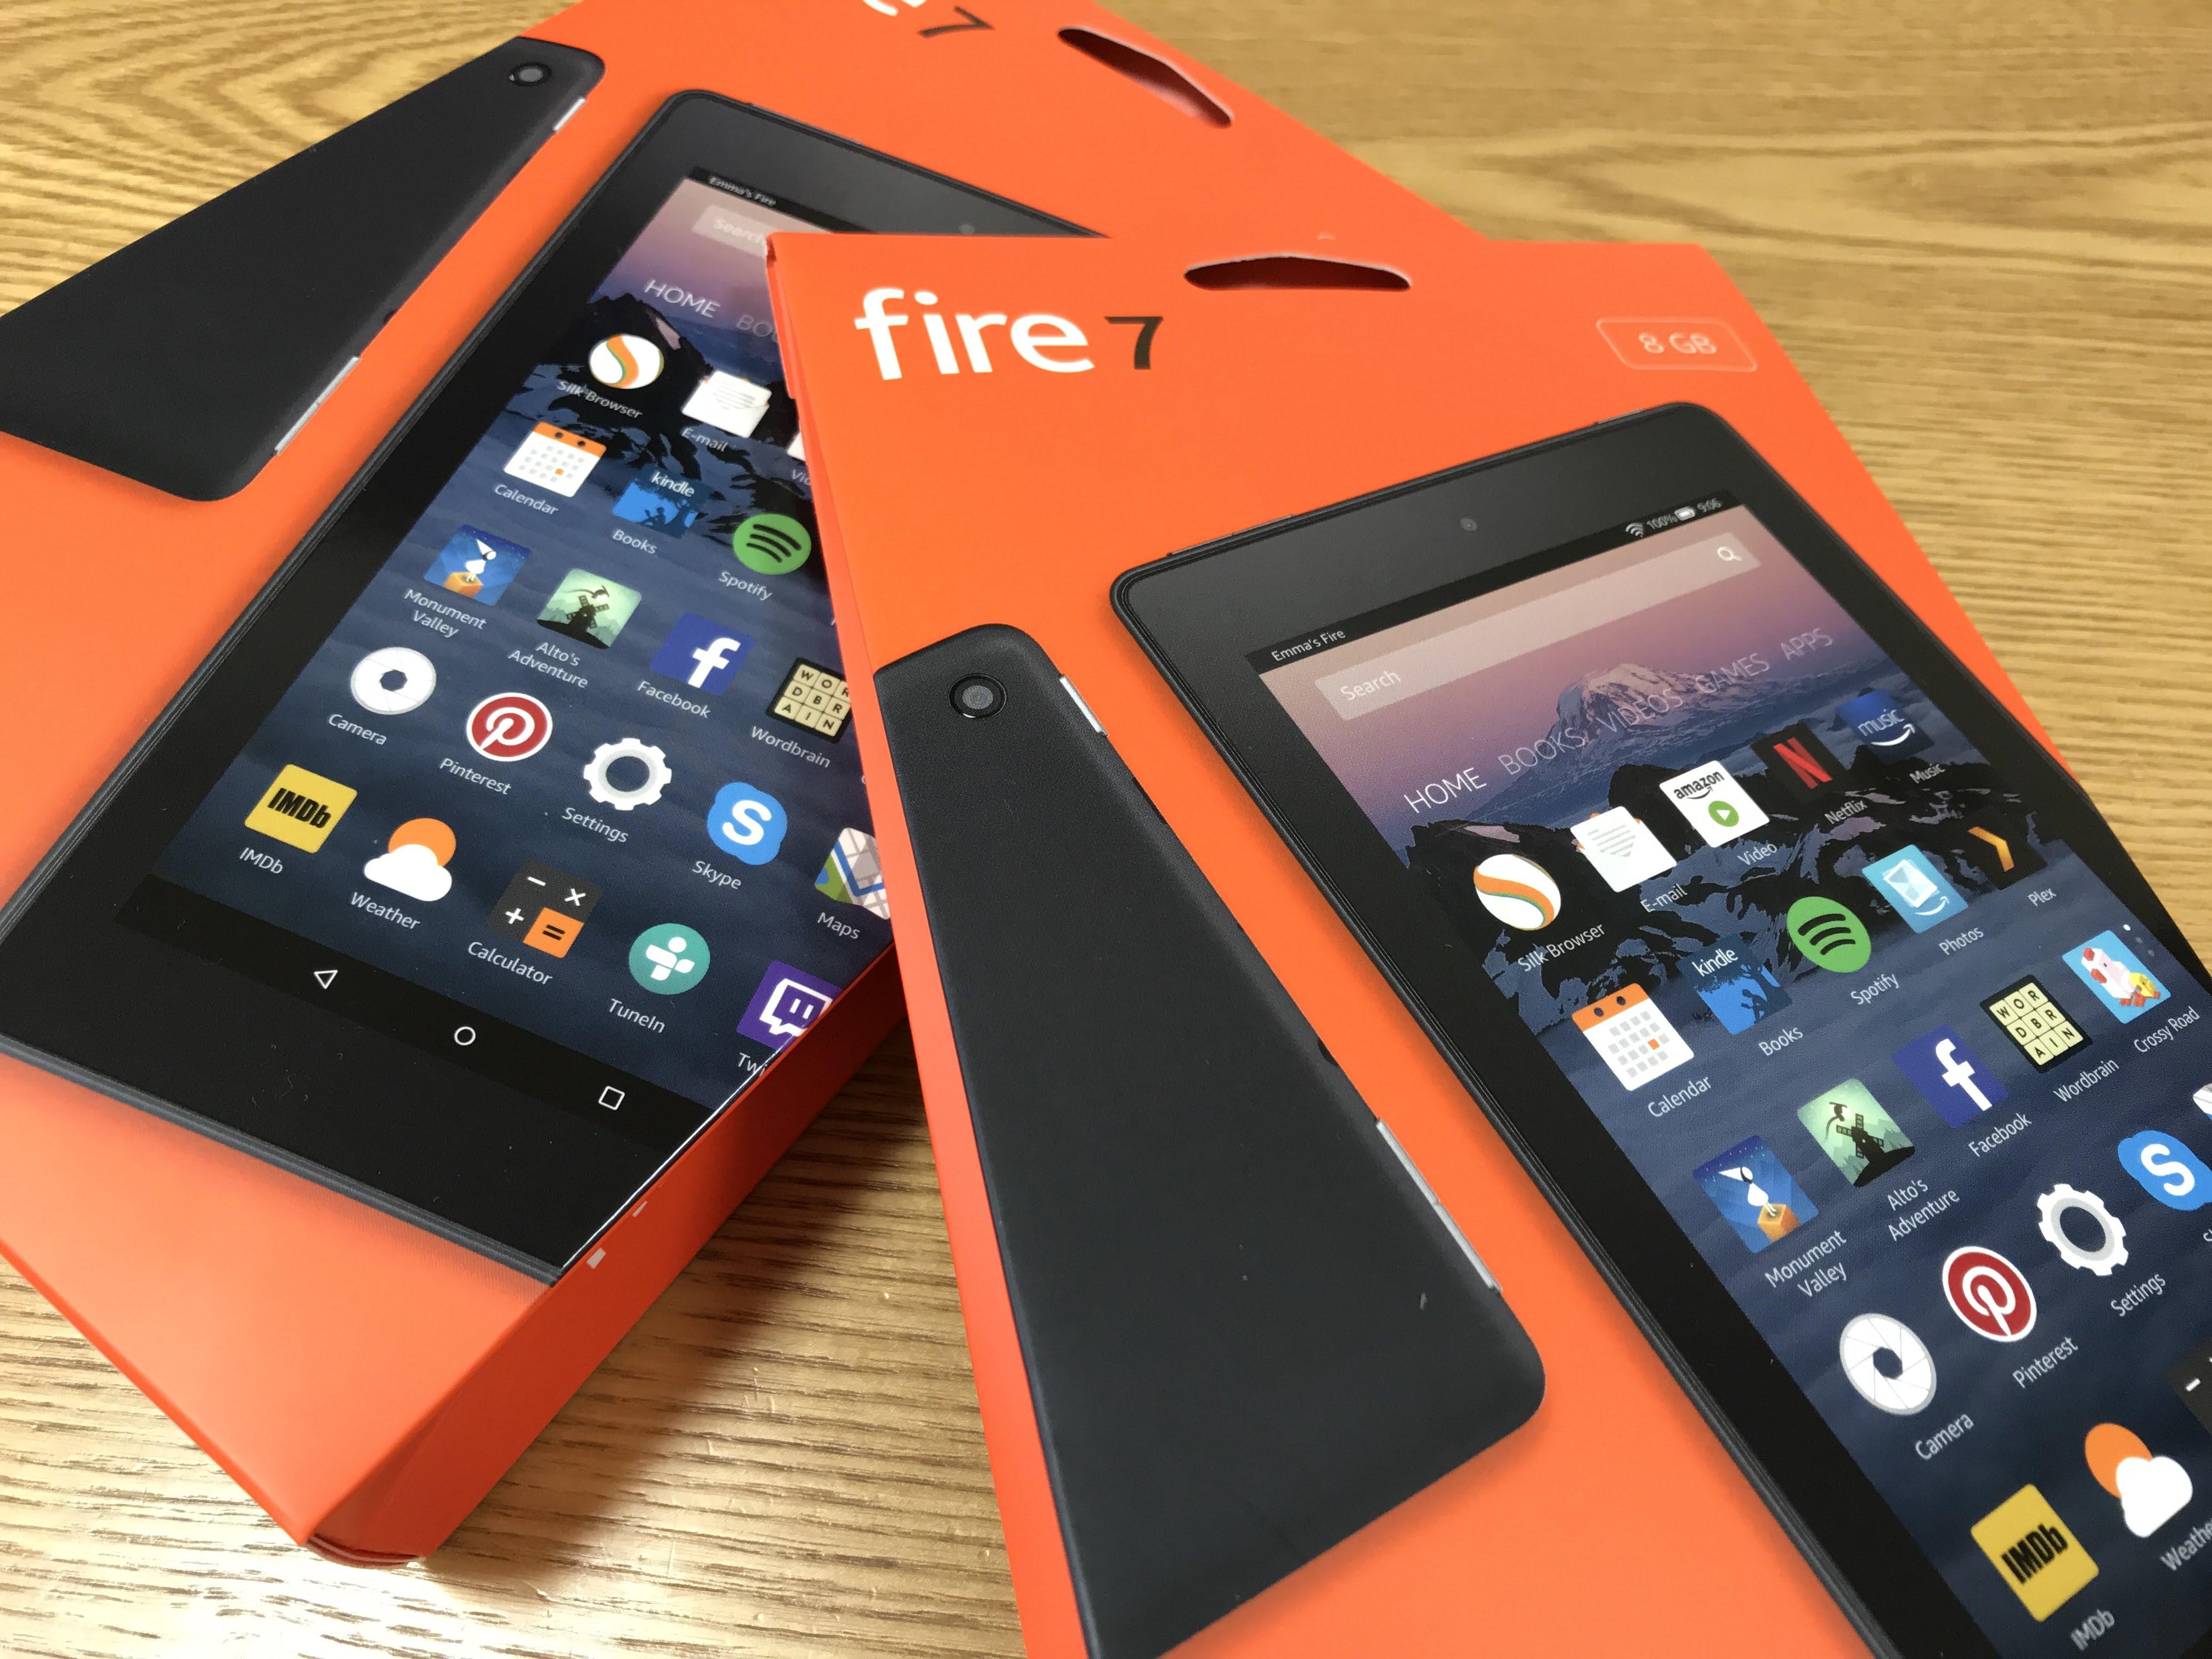 Kindle Fire7をまとめ買いで2台購入し、我が家のタブレットは6台体制に!